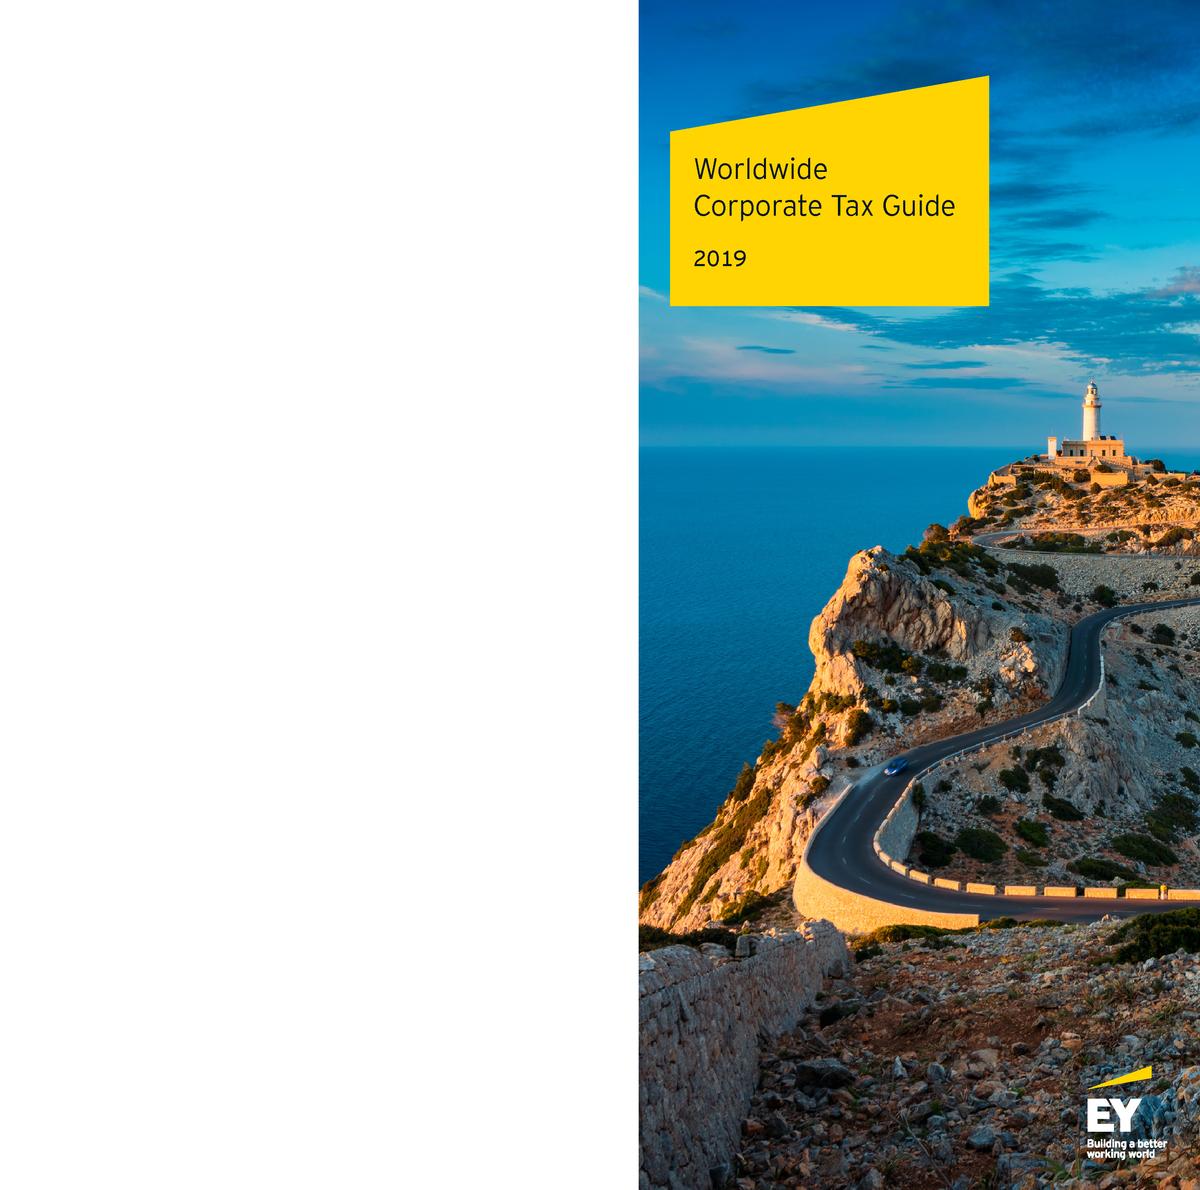 EY 2019 Worldwide Corporate Tax Guide - Tax Compliance - StuDocu